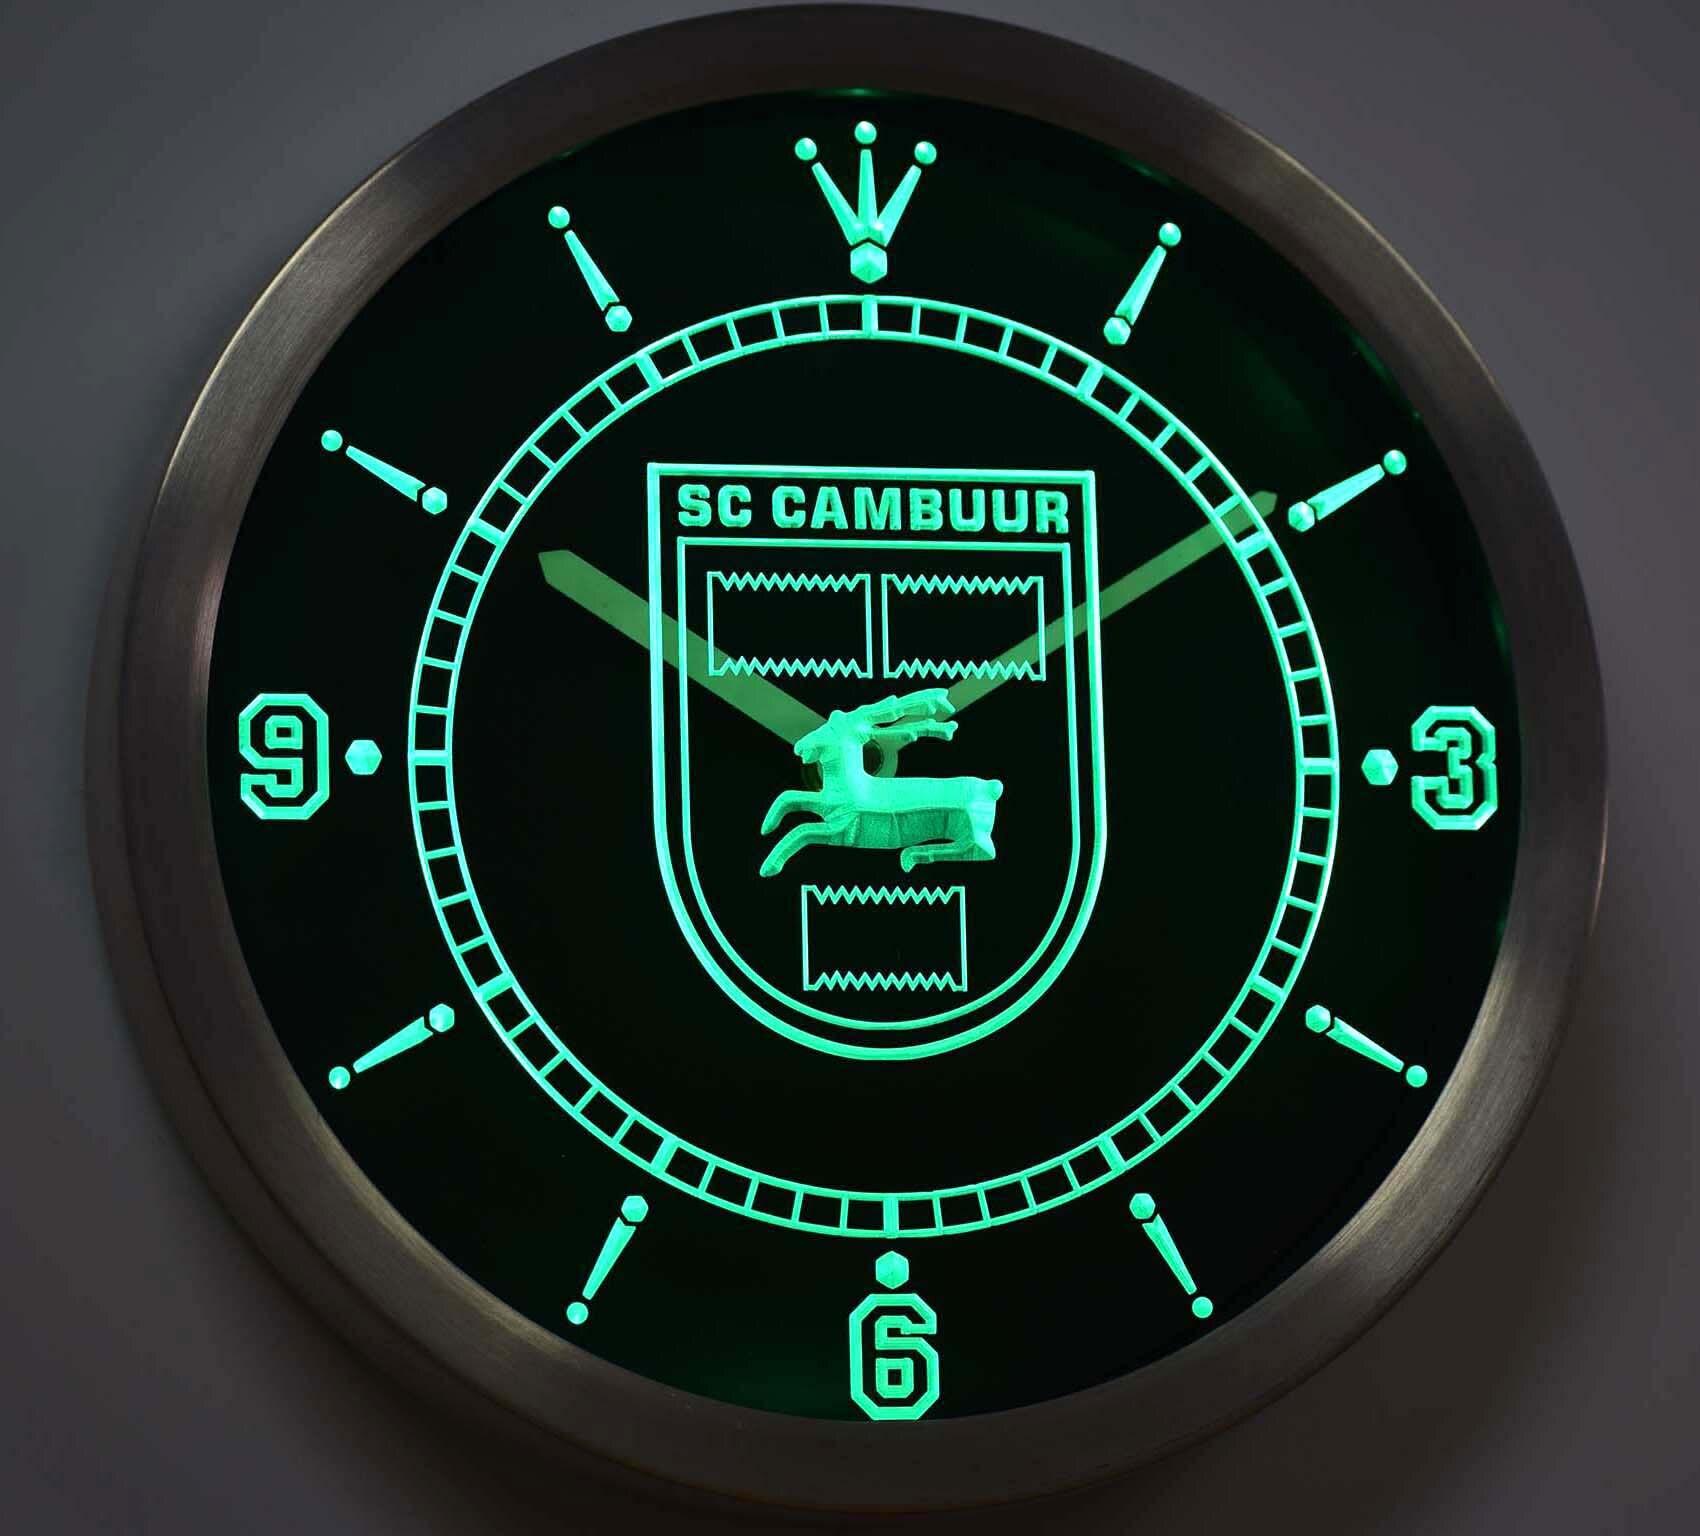 Nc1019 sc cambuur leeuwarden eredivisie futebol sinais de luz néon led relógio parede